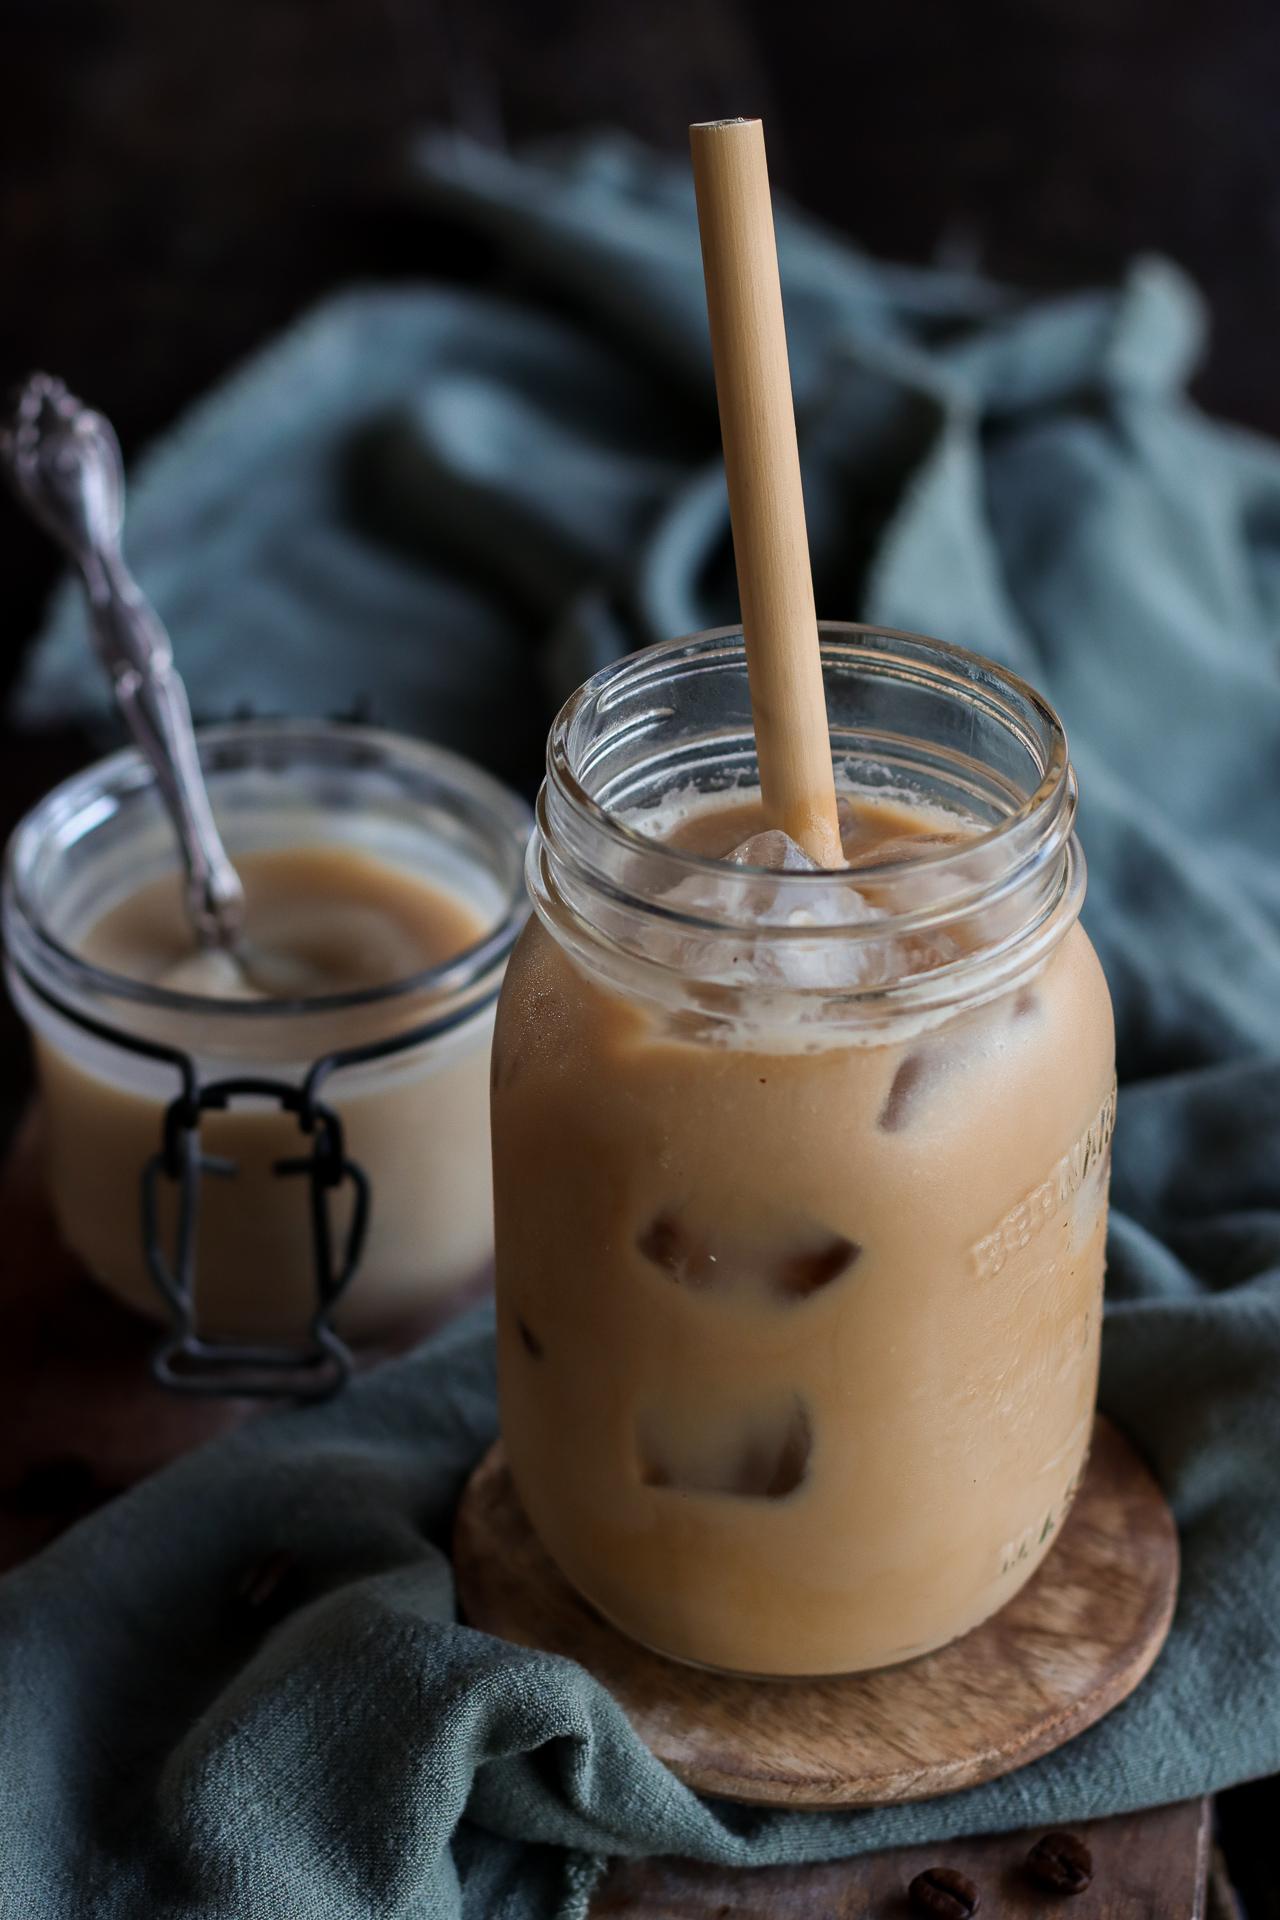 Main image of Sweetened Condensed Milk Iced Coffee